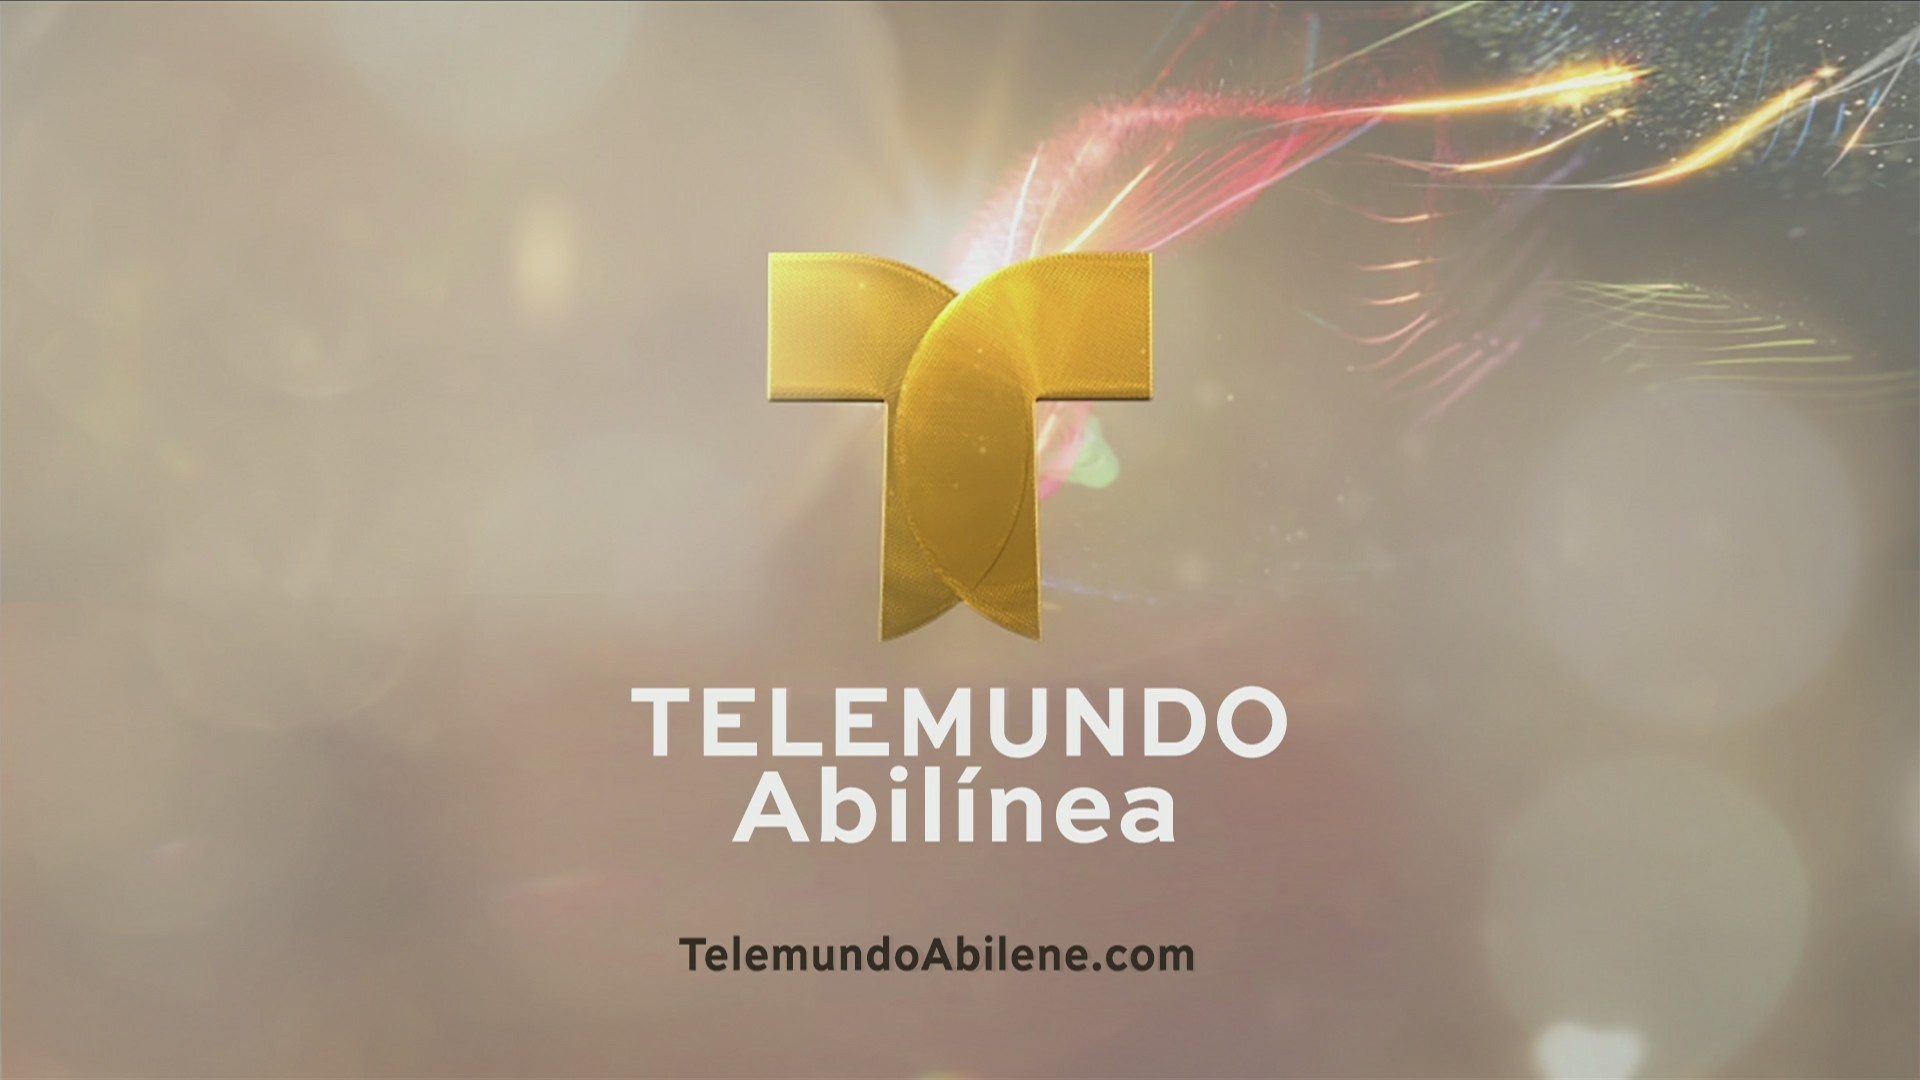 Telemundo Abilínea - abril 26, 2019